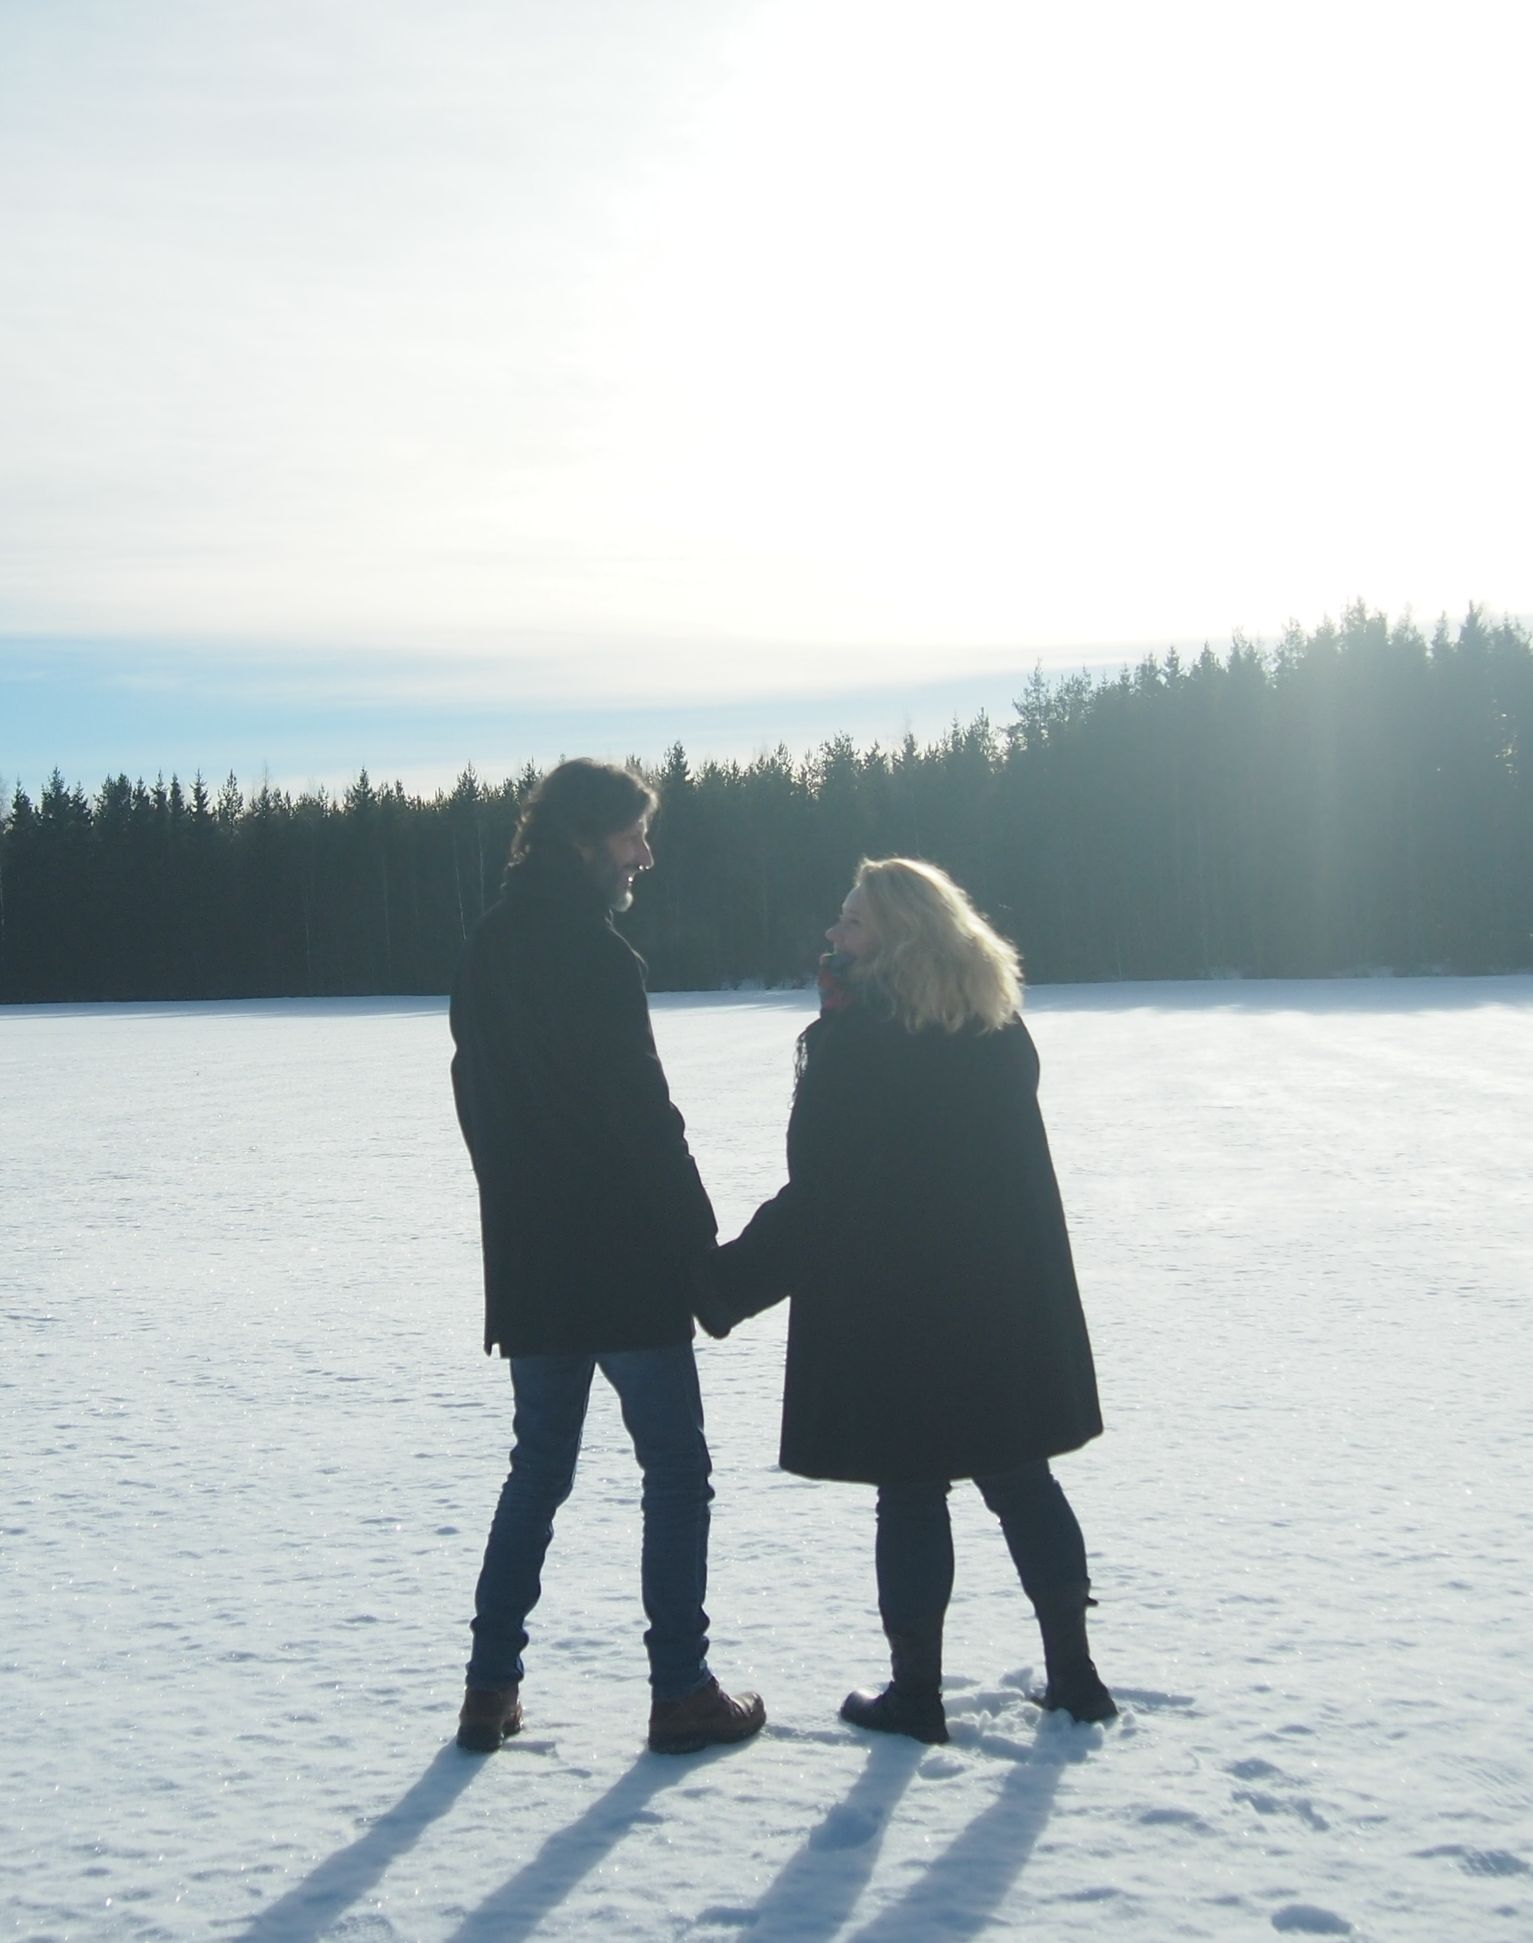 musta dating sites Kanadassa